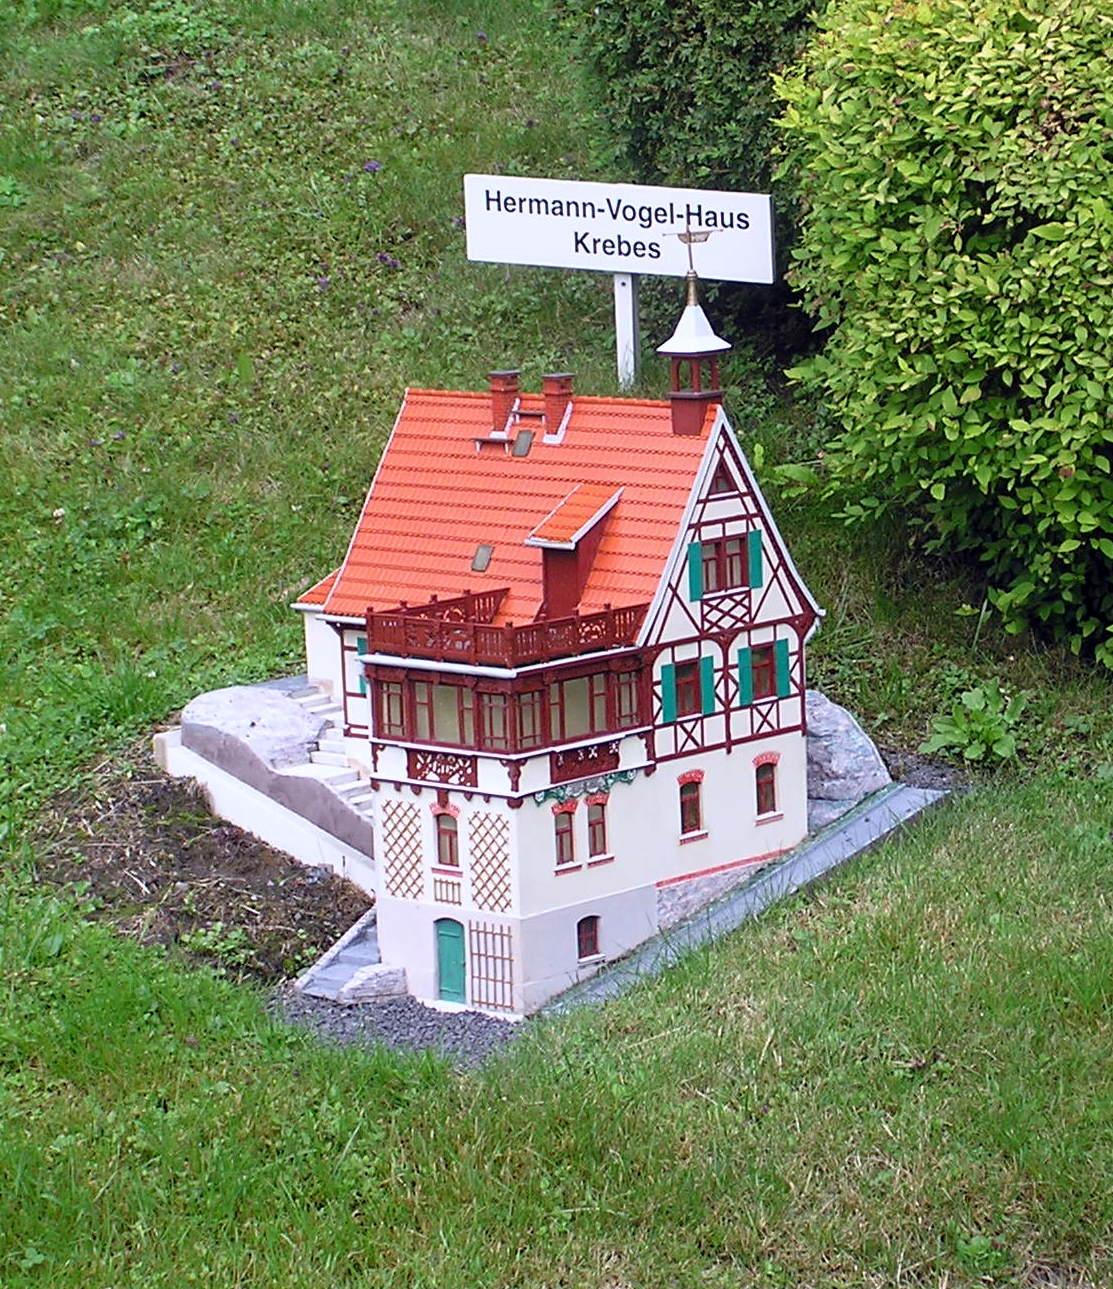 file hermann vogel haus krebes miniatur jpg wikimedia commons. Black Bedroom Furniture Sets. Home Design Ideas